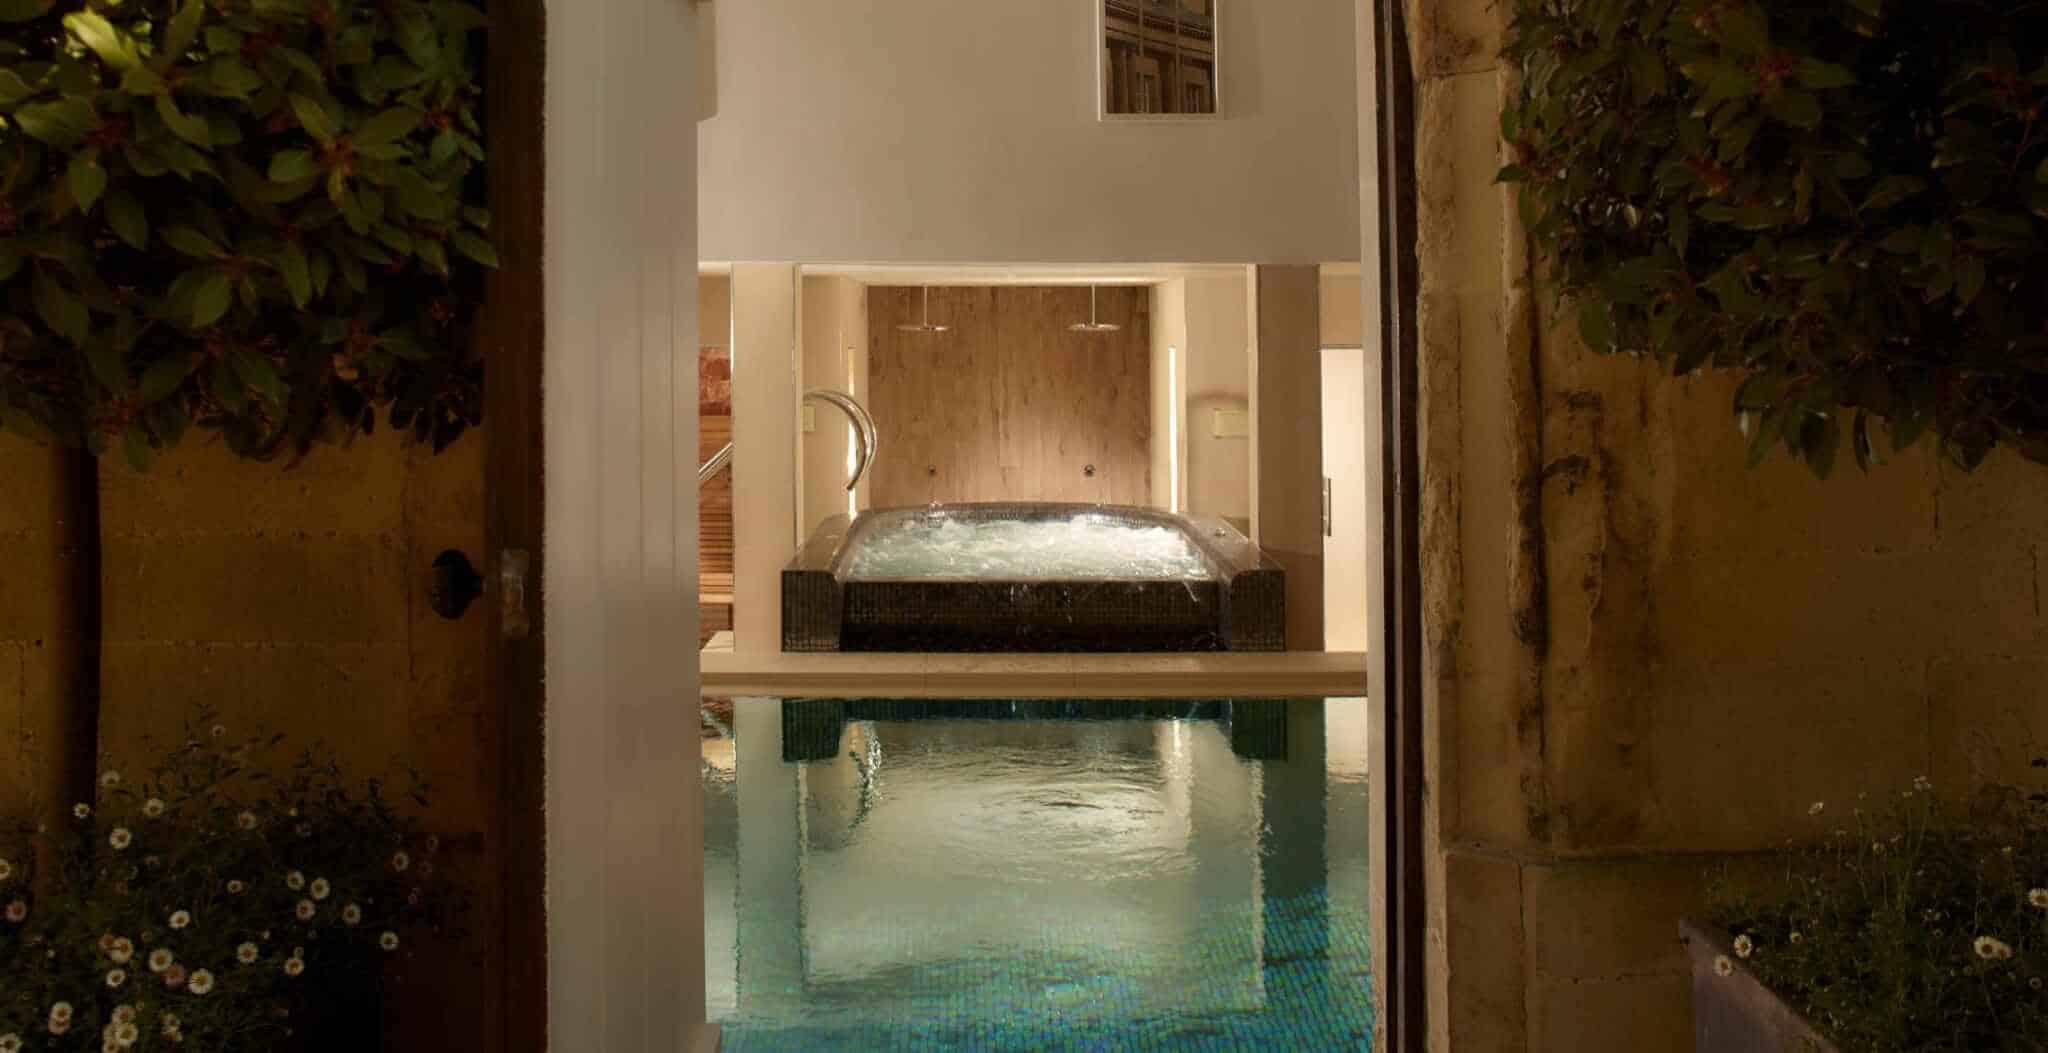 Romantic Hotels Hotels For Romantic Breaks Historic UK